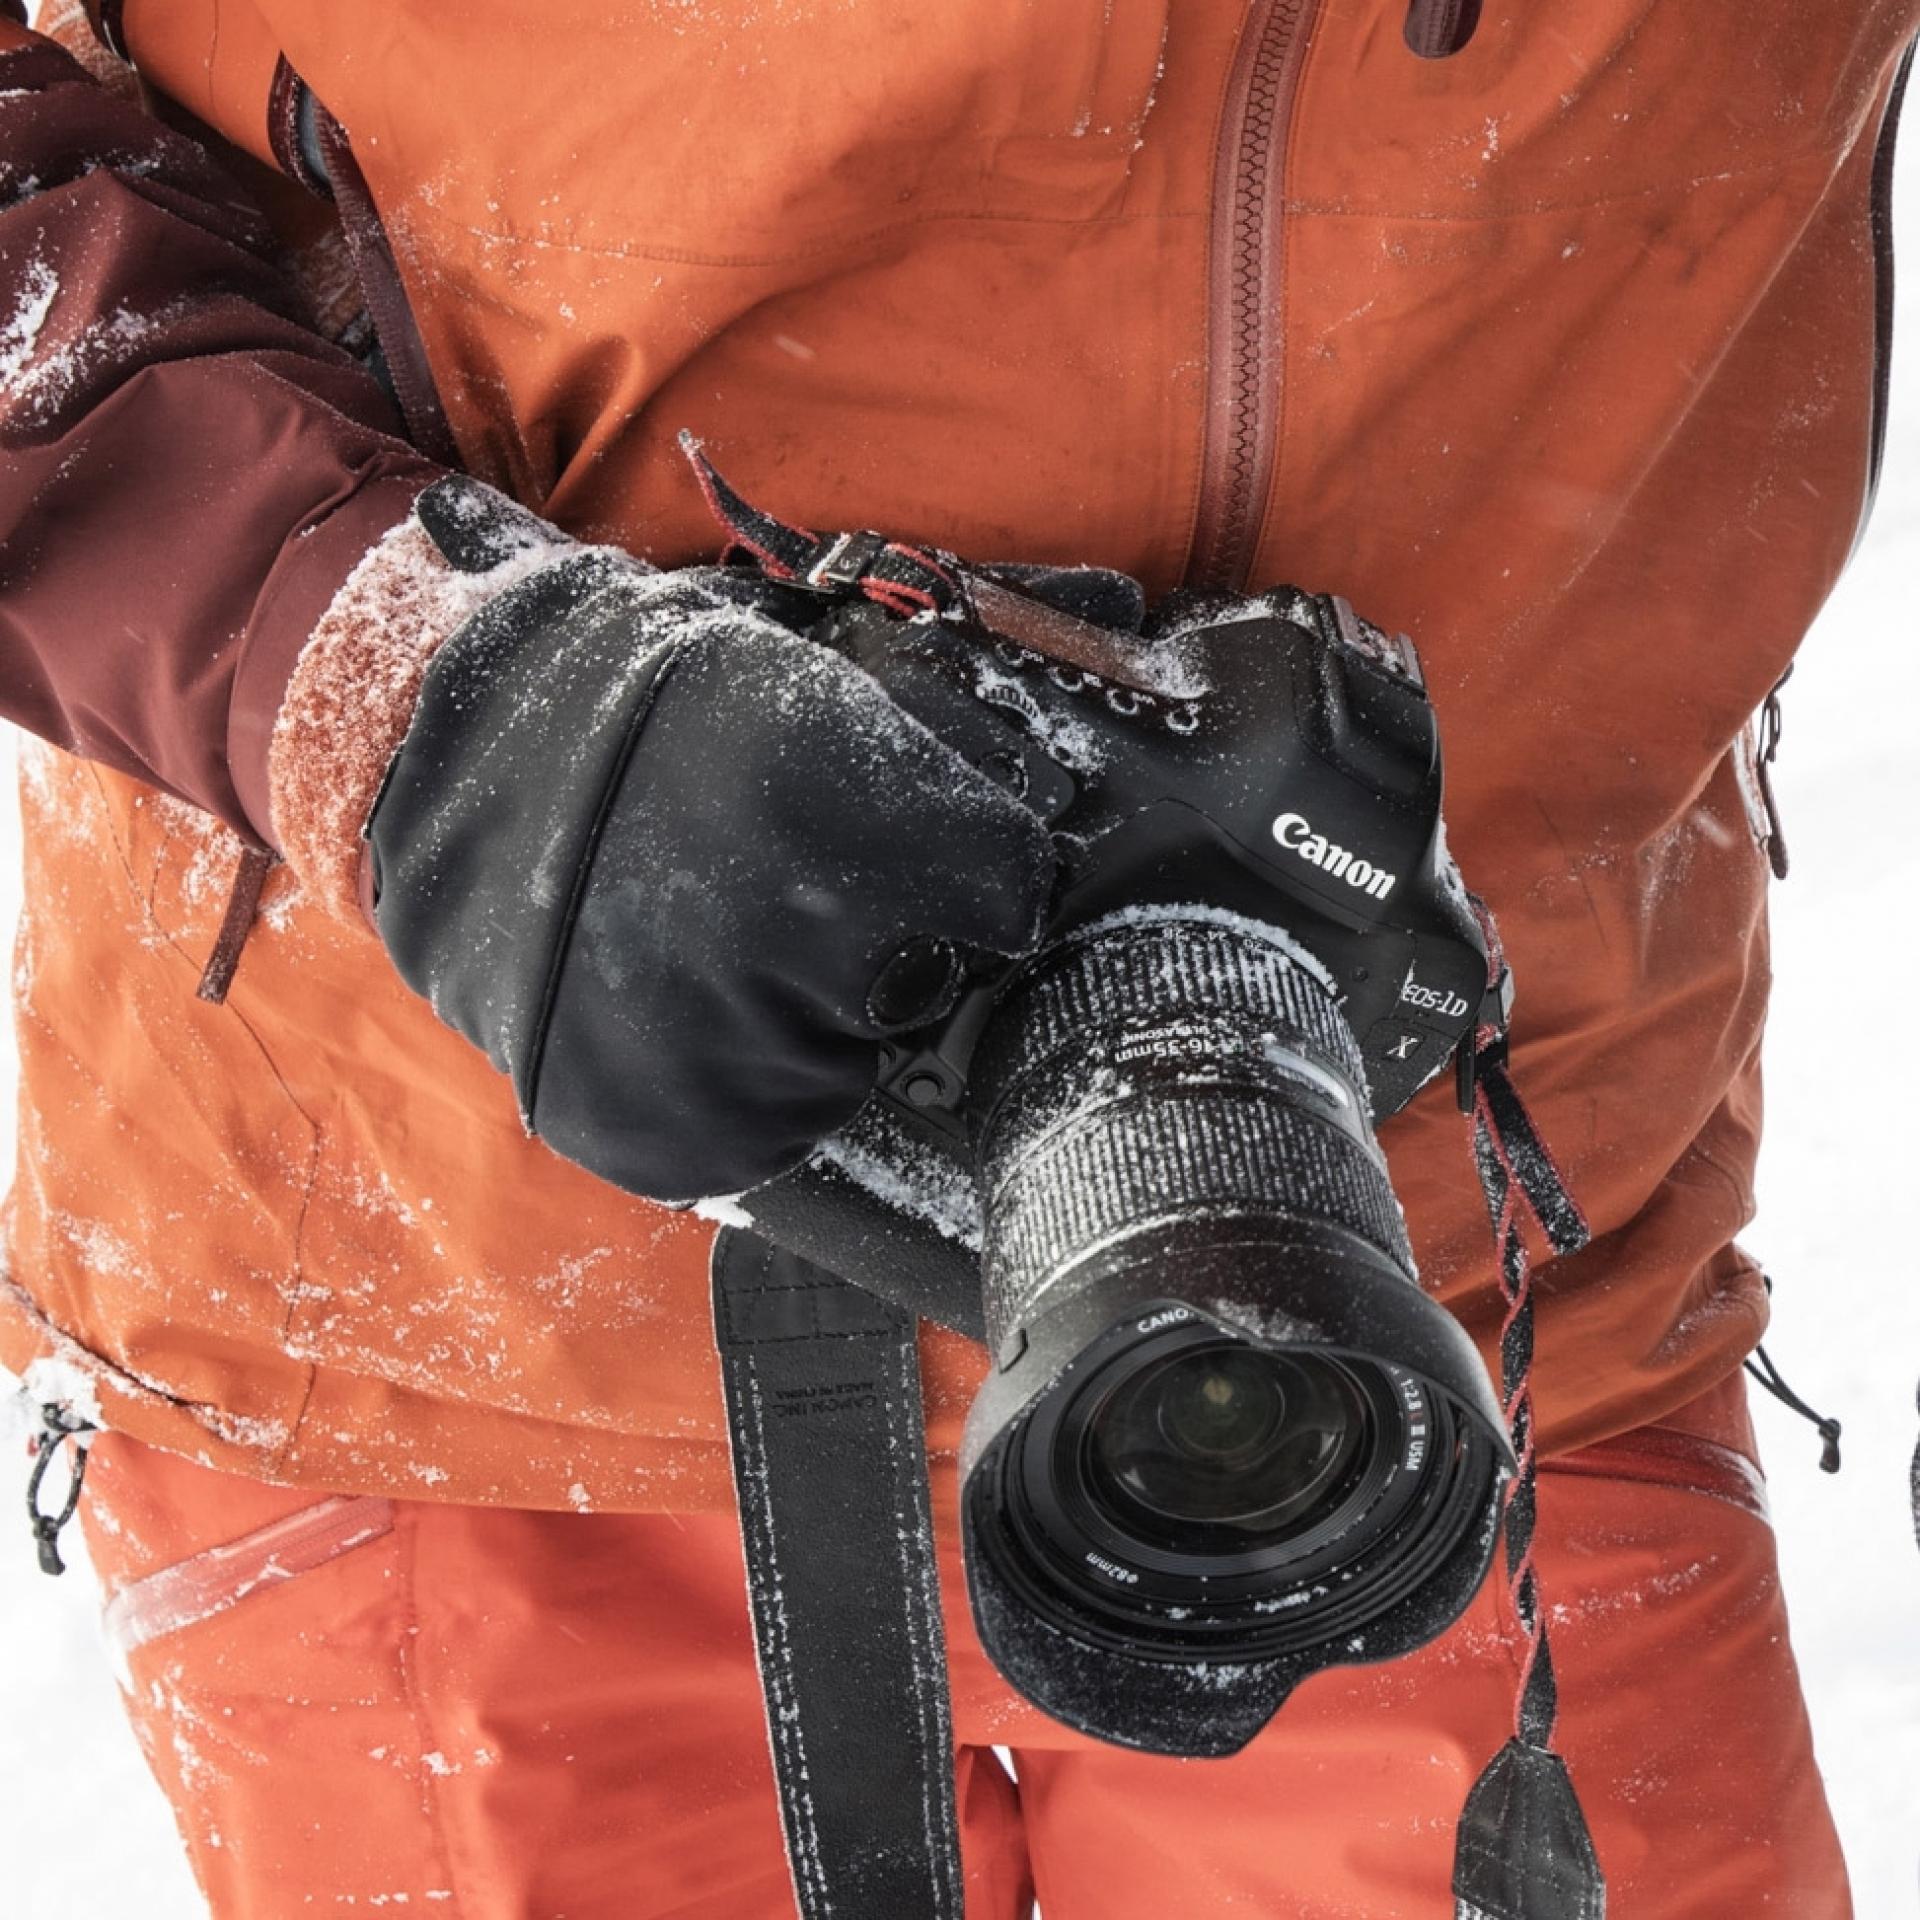 Kamera, Winter, Fotografie, robust, Minusgrad, Objektiv, Schnee